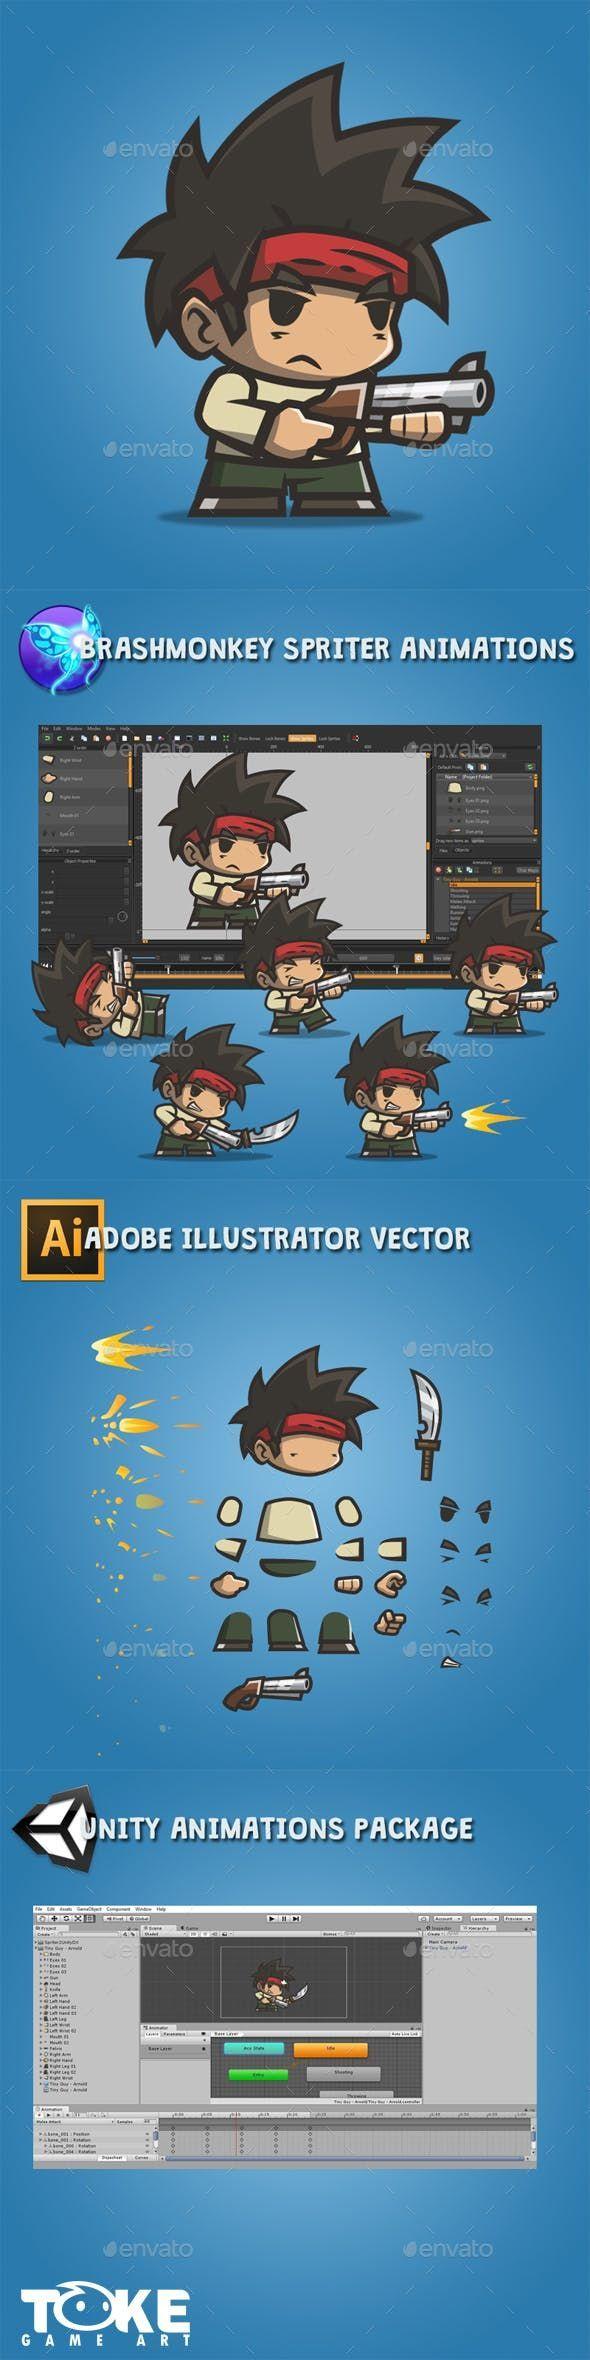 Little Man Arnold — Stock Vector #spriter #game art 2d-Game Assets-   – Game Art